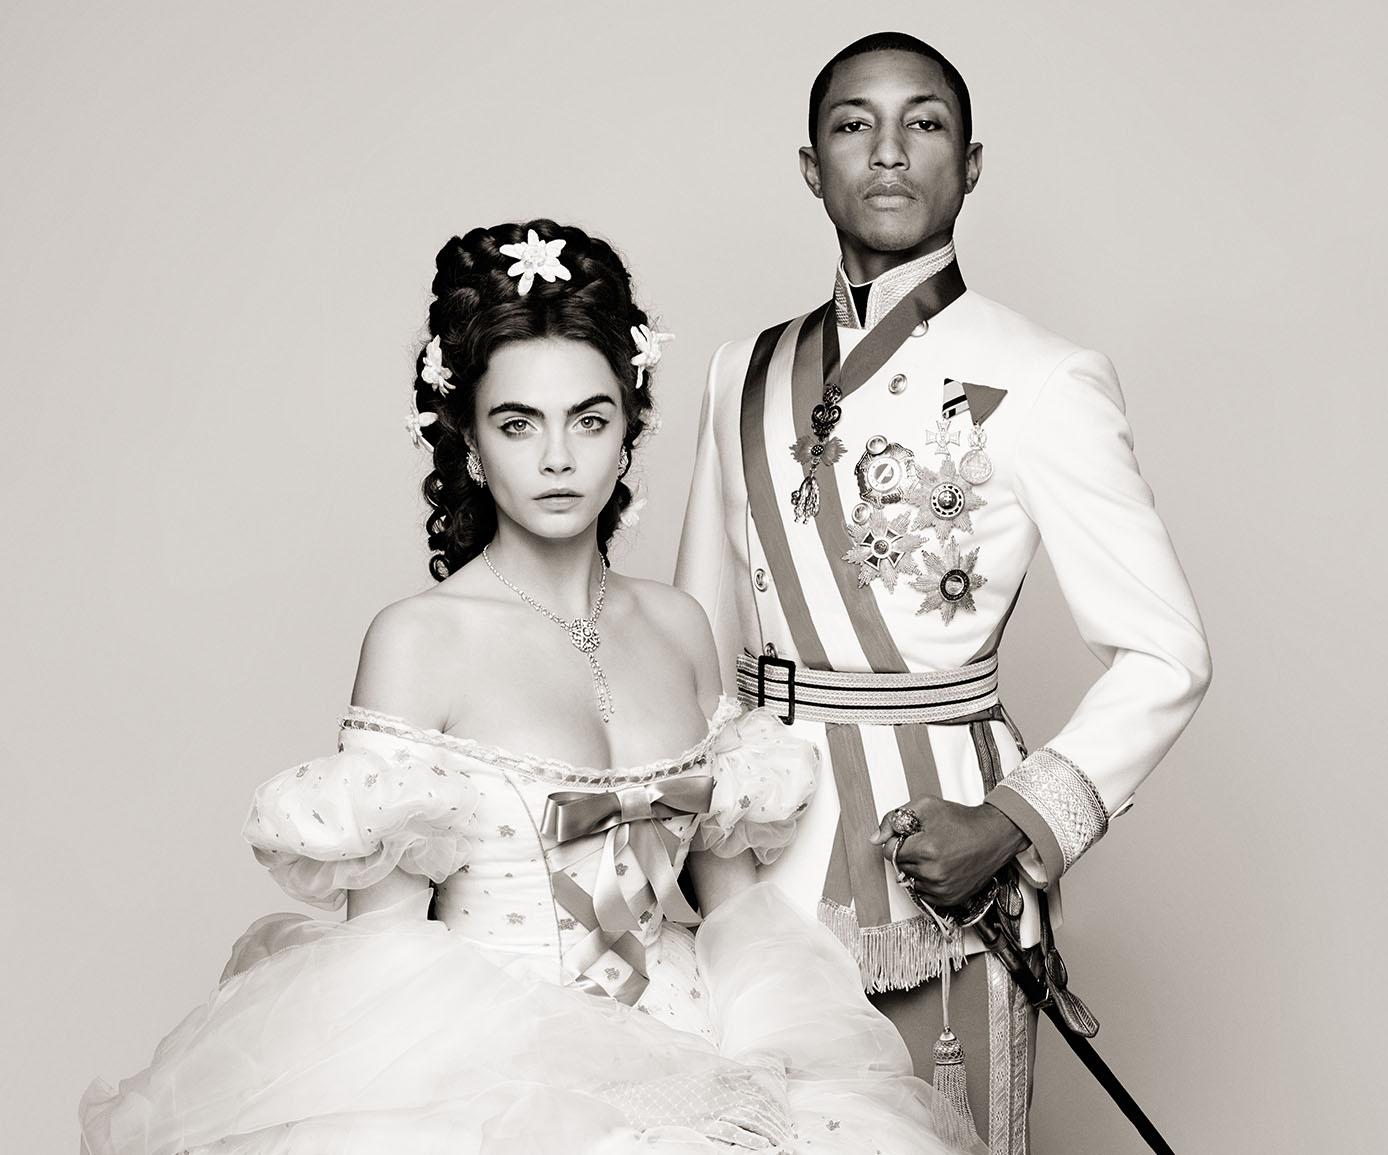 Pharrell Williams Cara Delevingne - Reincarnation by Karl Lagerfeld